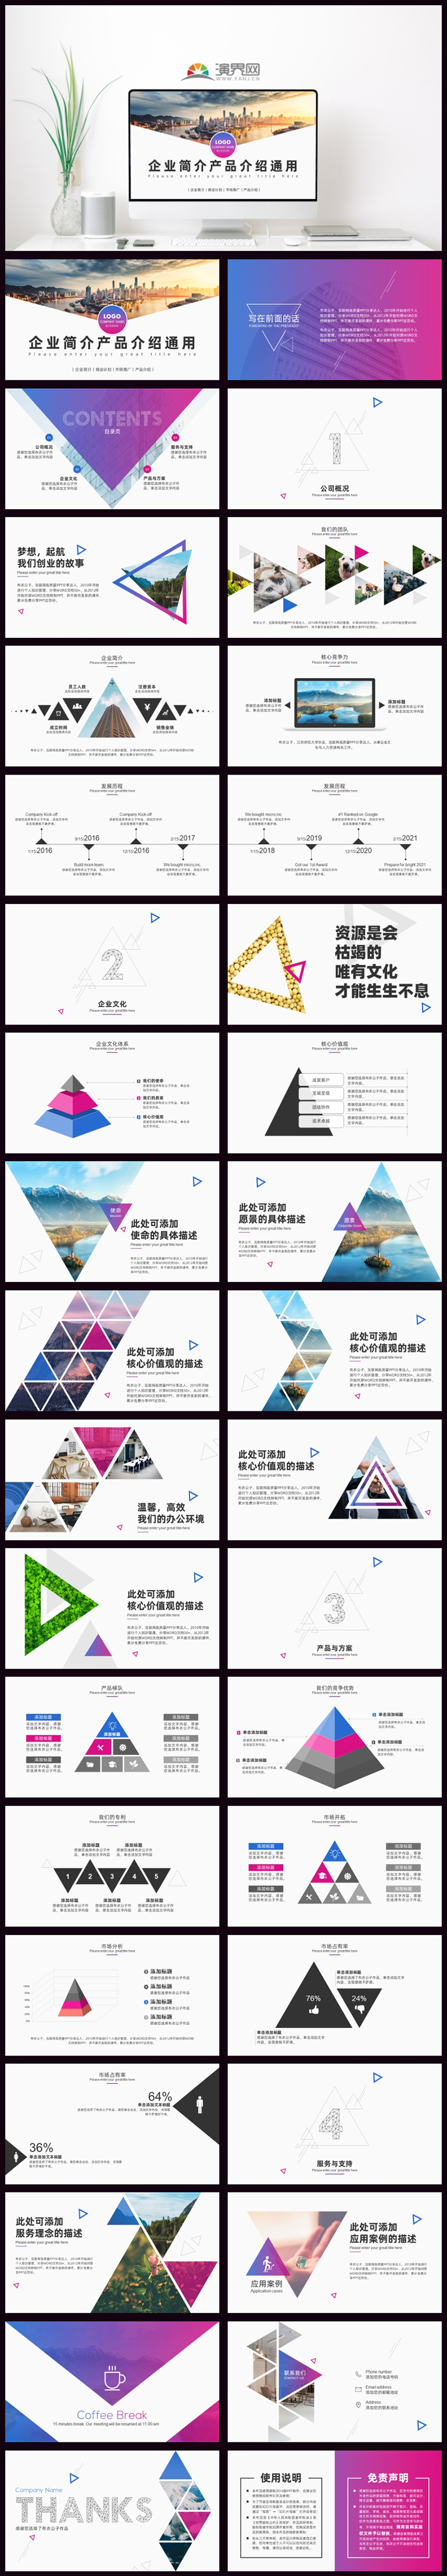 S052-三角形2020企业简介产品介绍PPT模板(布衣公子作品)